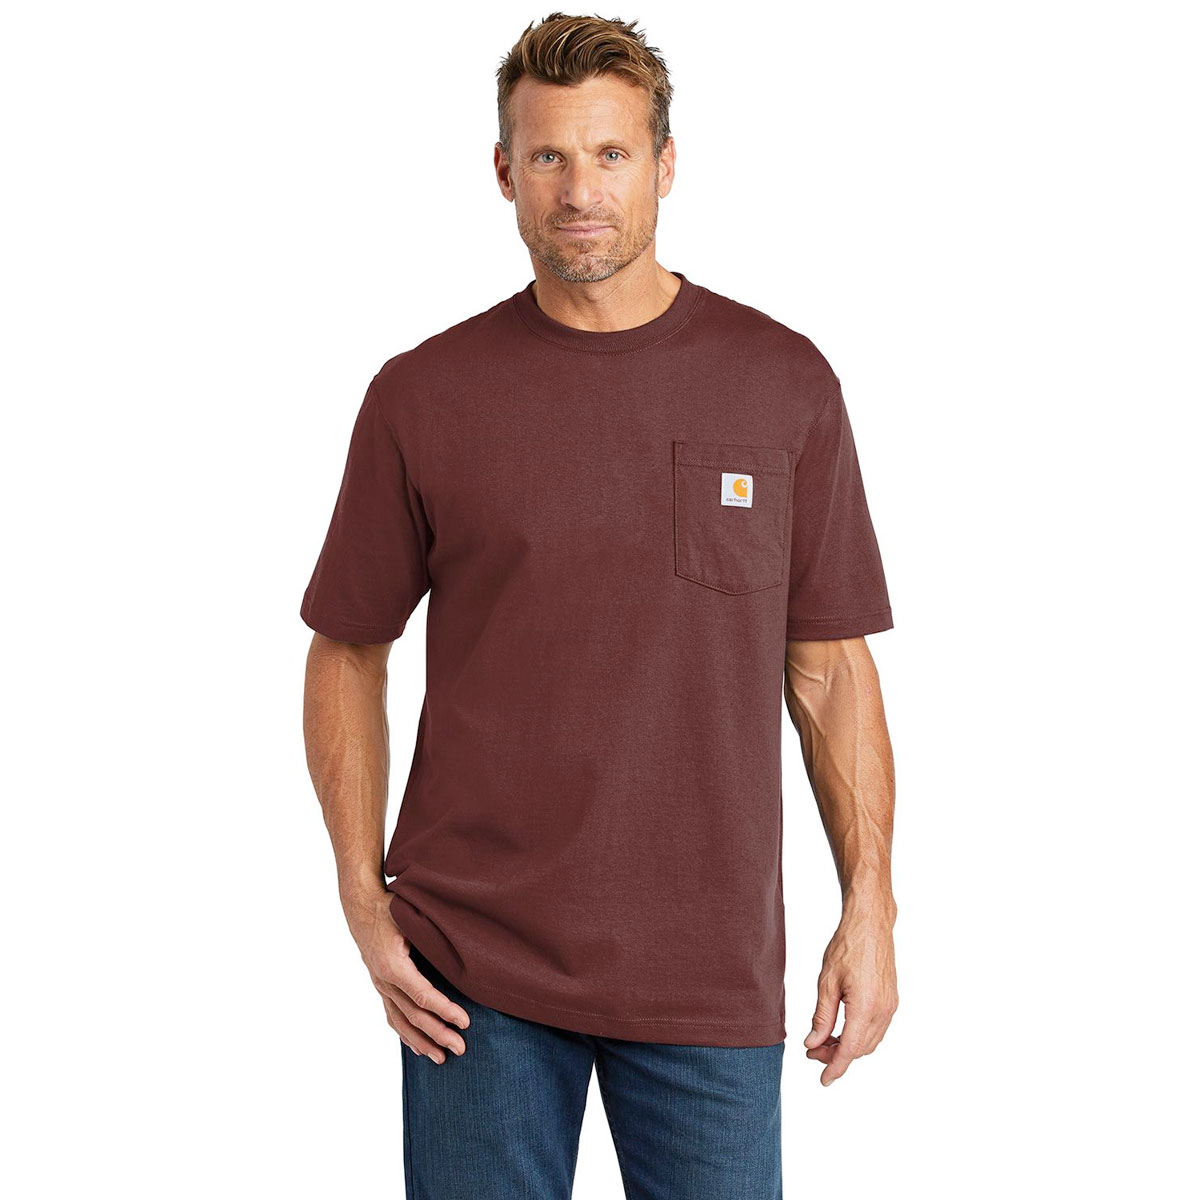 Men's Workwear Short Sleeve T Shirt, Walnut, swatch